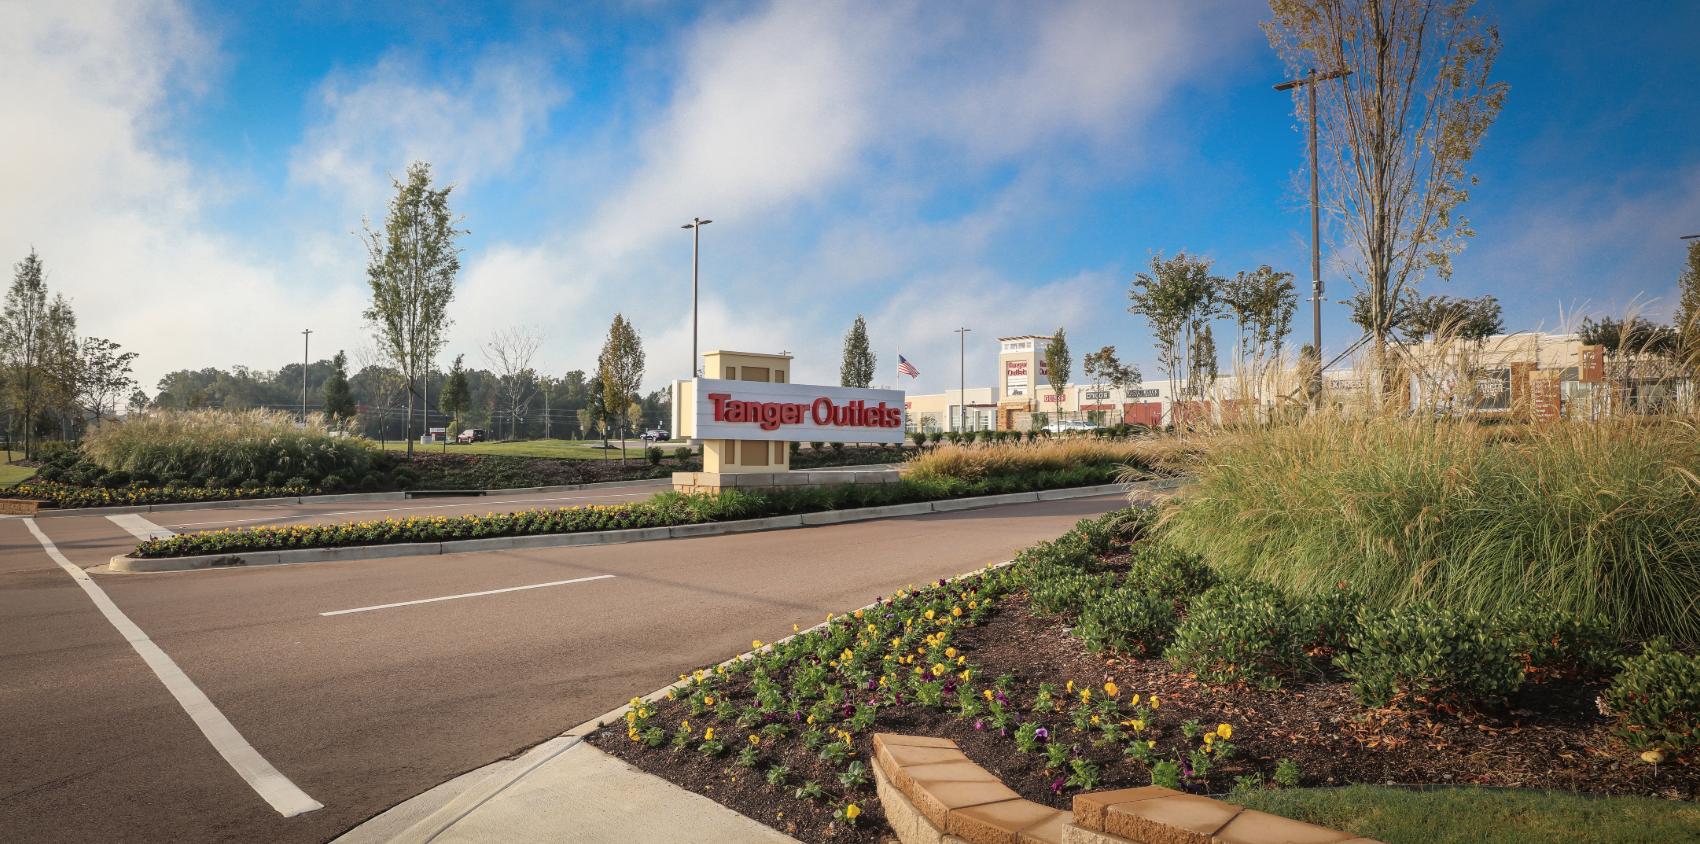 Shopping center entrance landscape